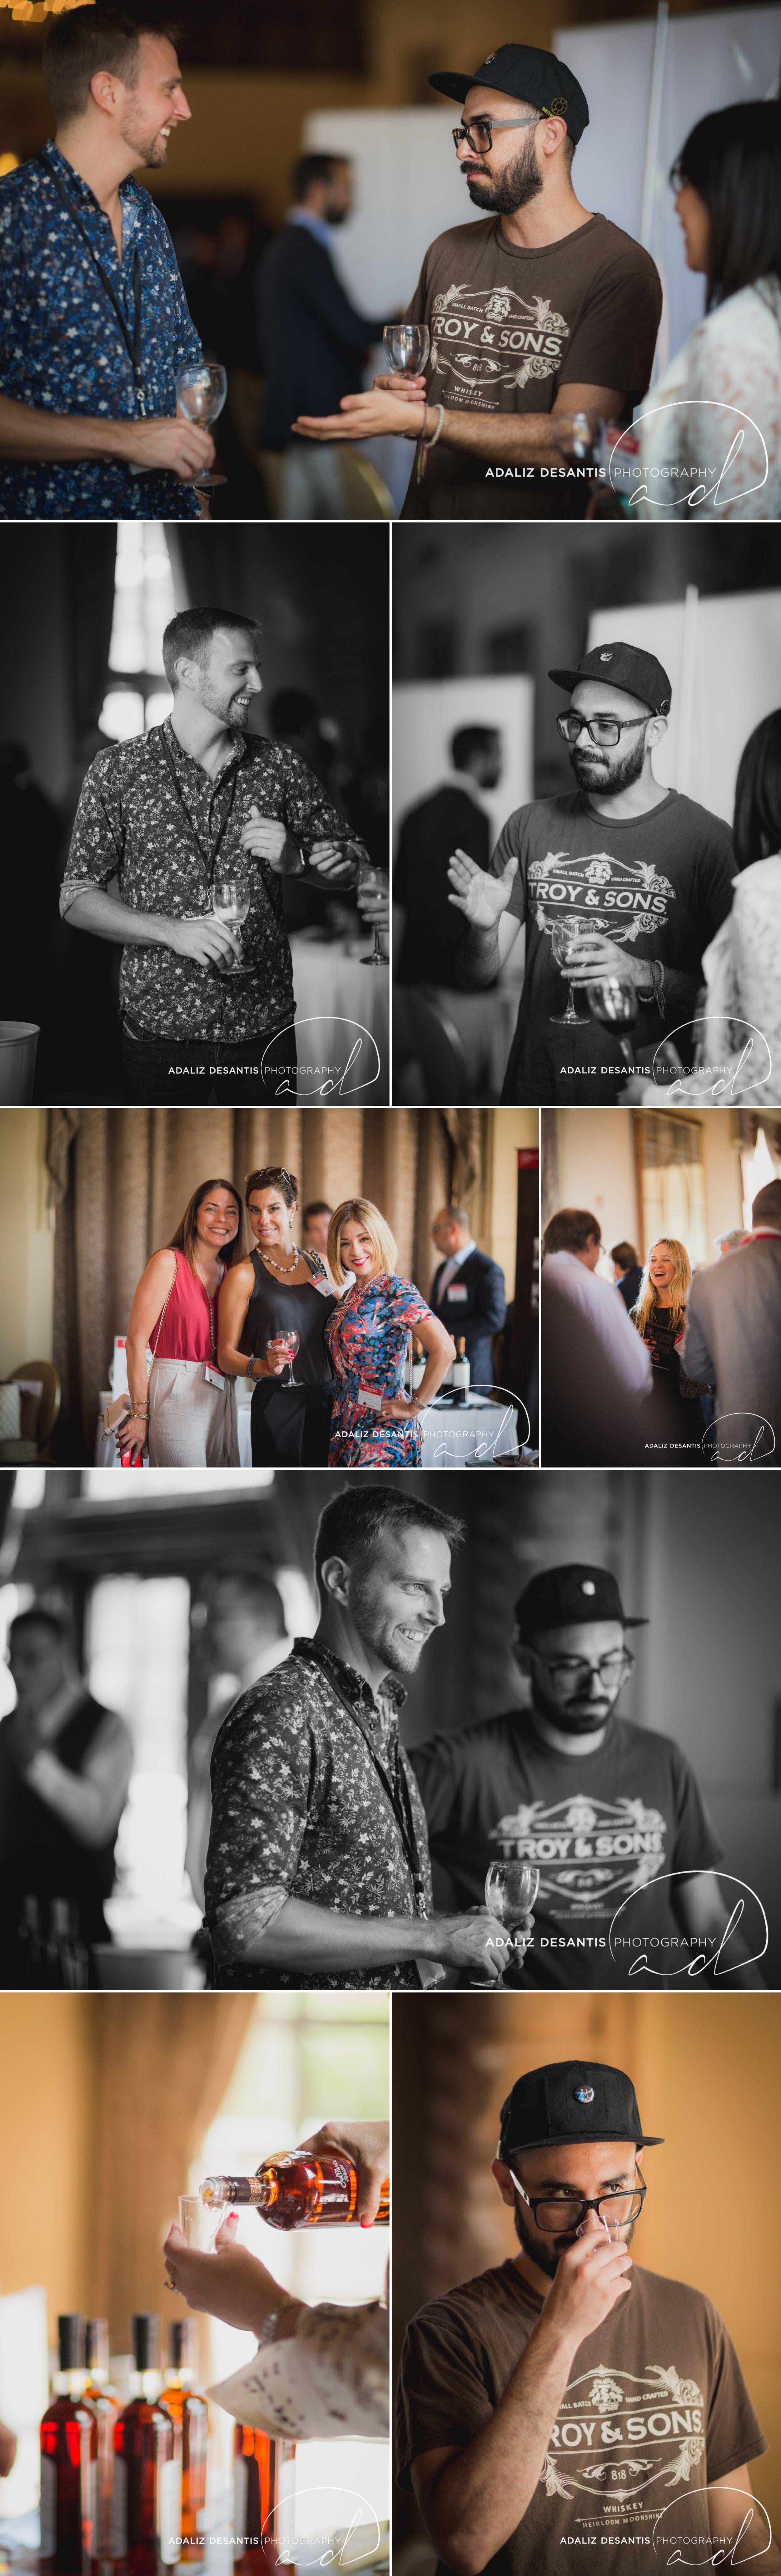 hidalgo imports anniversary wine spirits tasting biltmore hotel coral gables florida miami 9.jpg